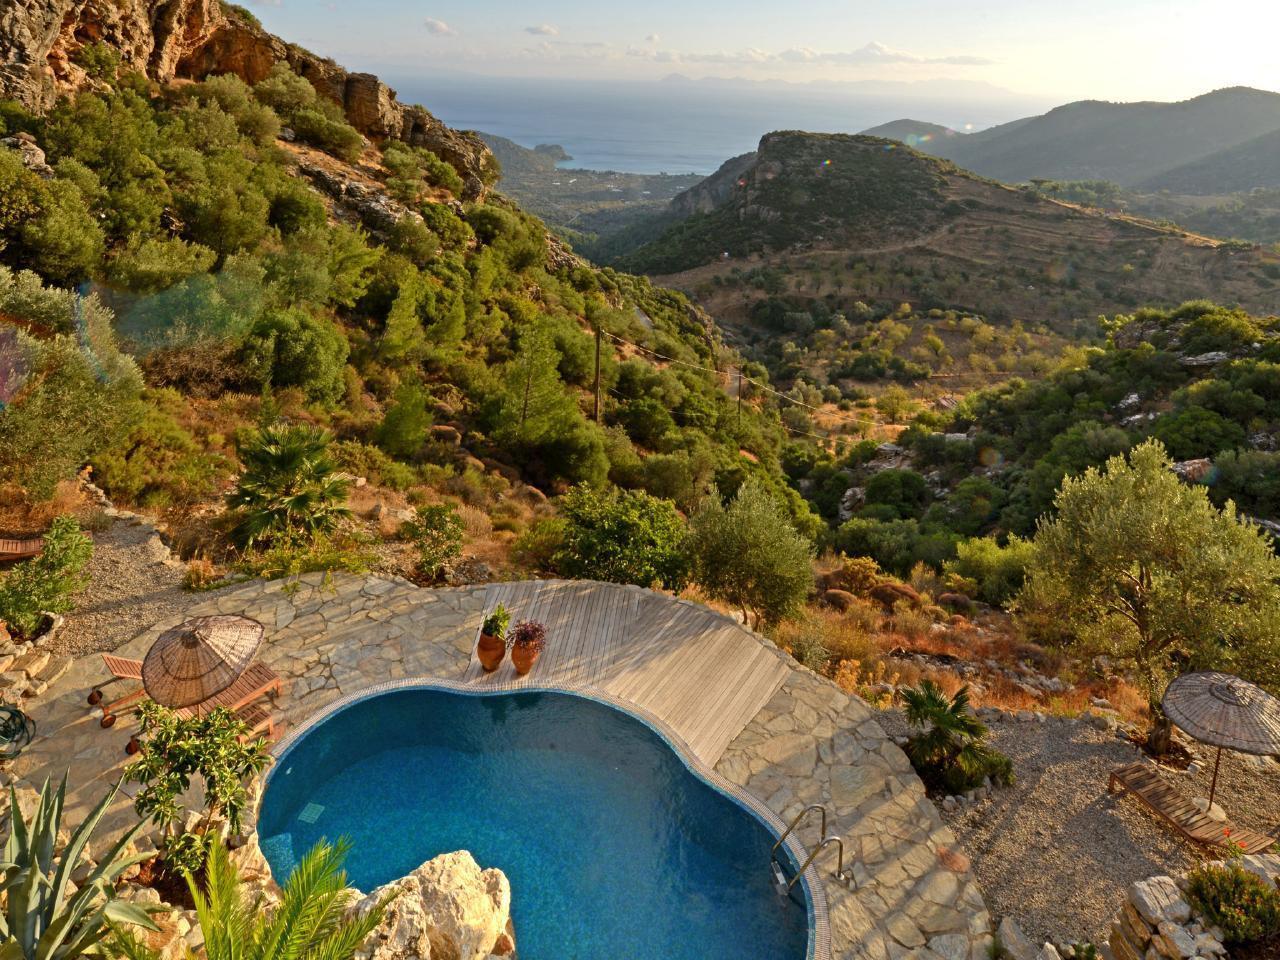 Maison de vacances Exklusives Chalet, romantisch am Berghang und Meer gelegen (2506674), Mesudiye, , Région Egéenne, Turquie, image 2